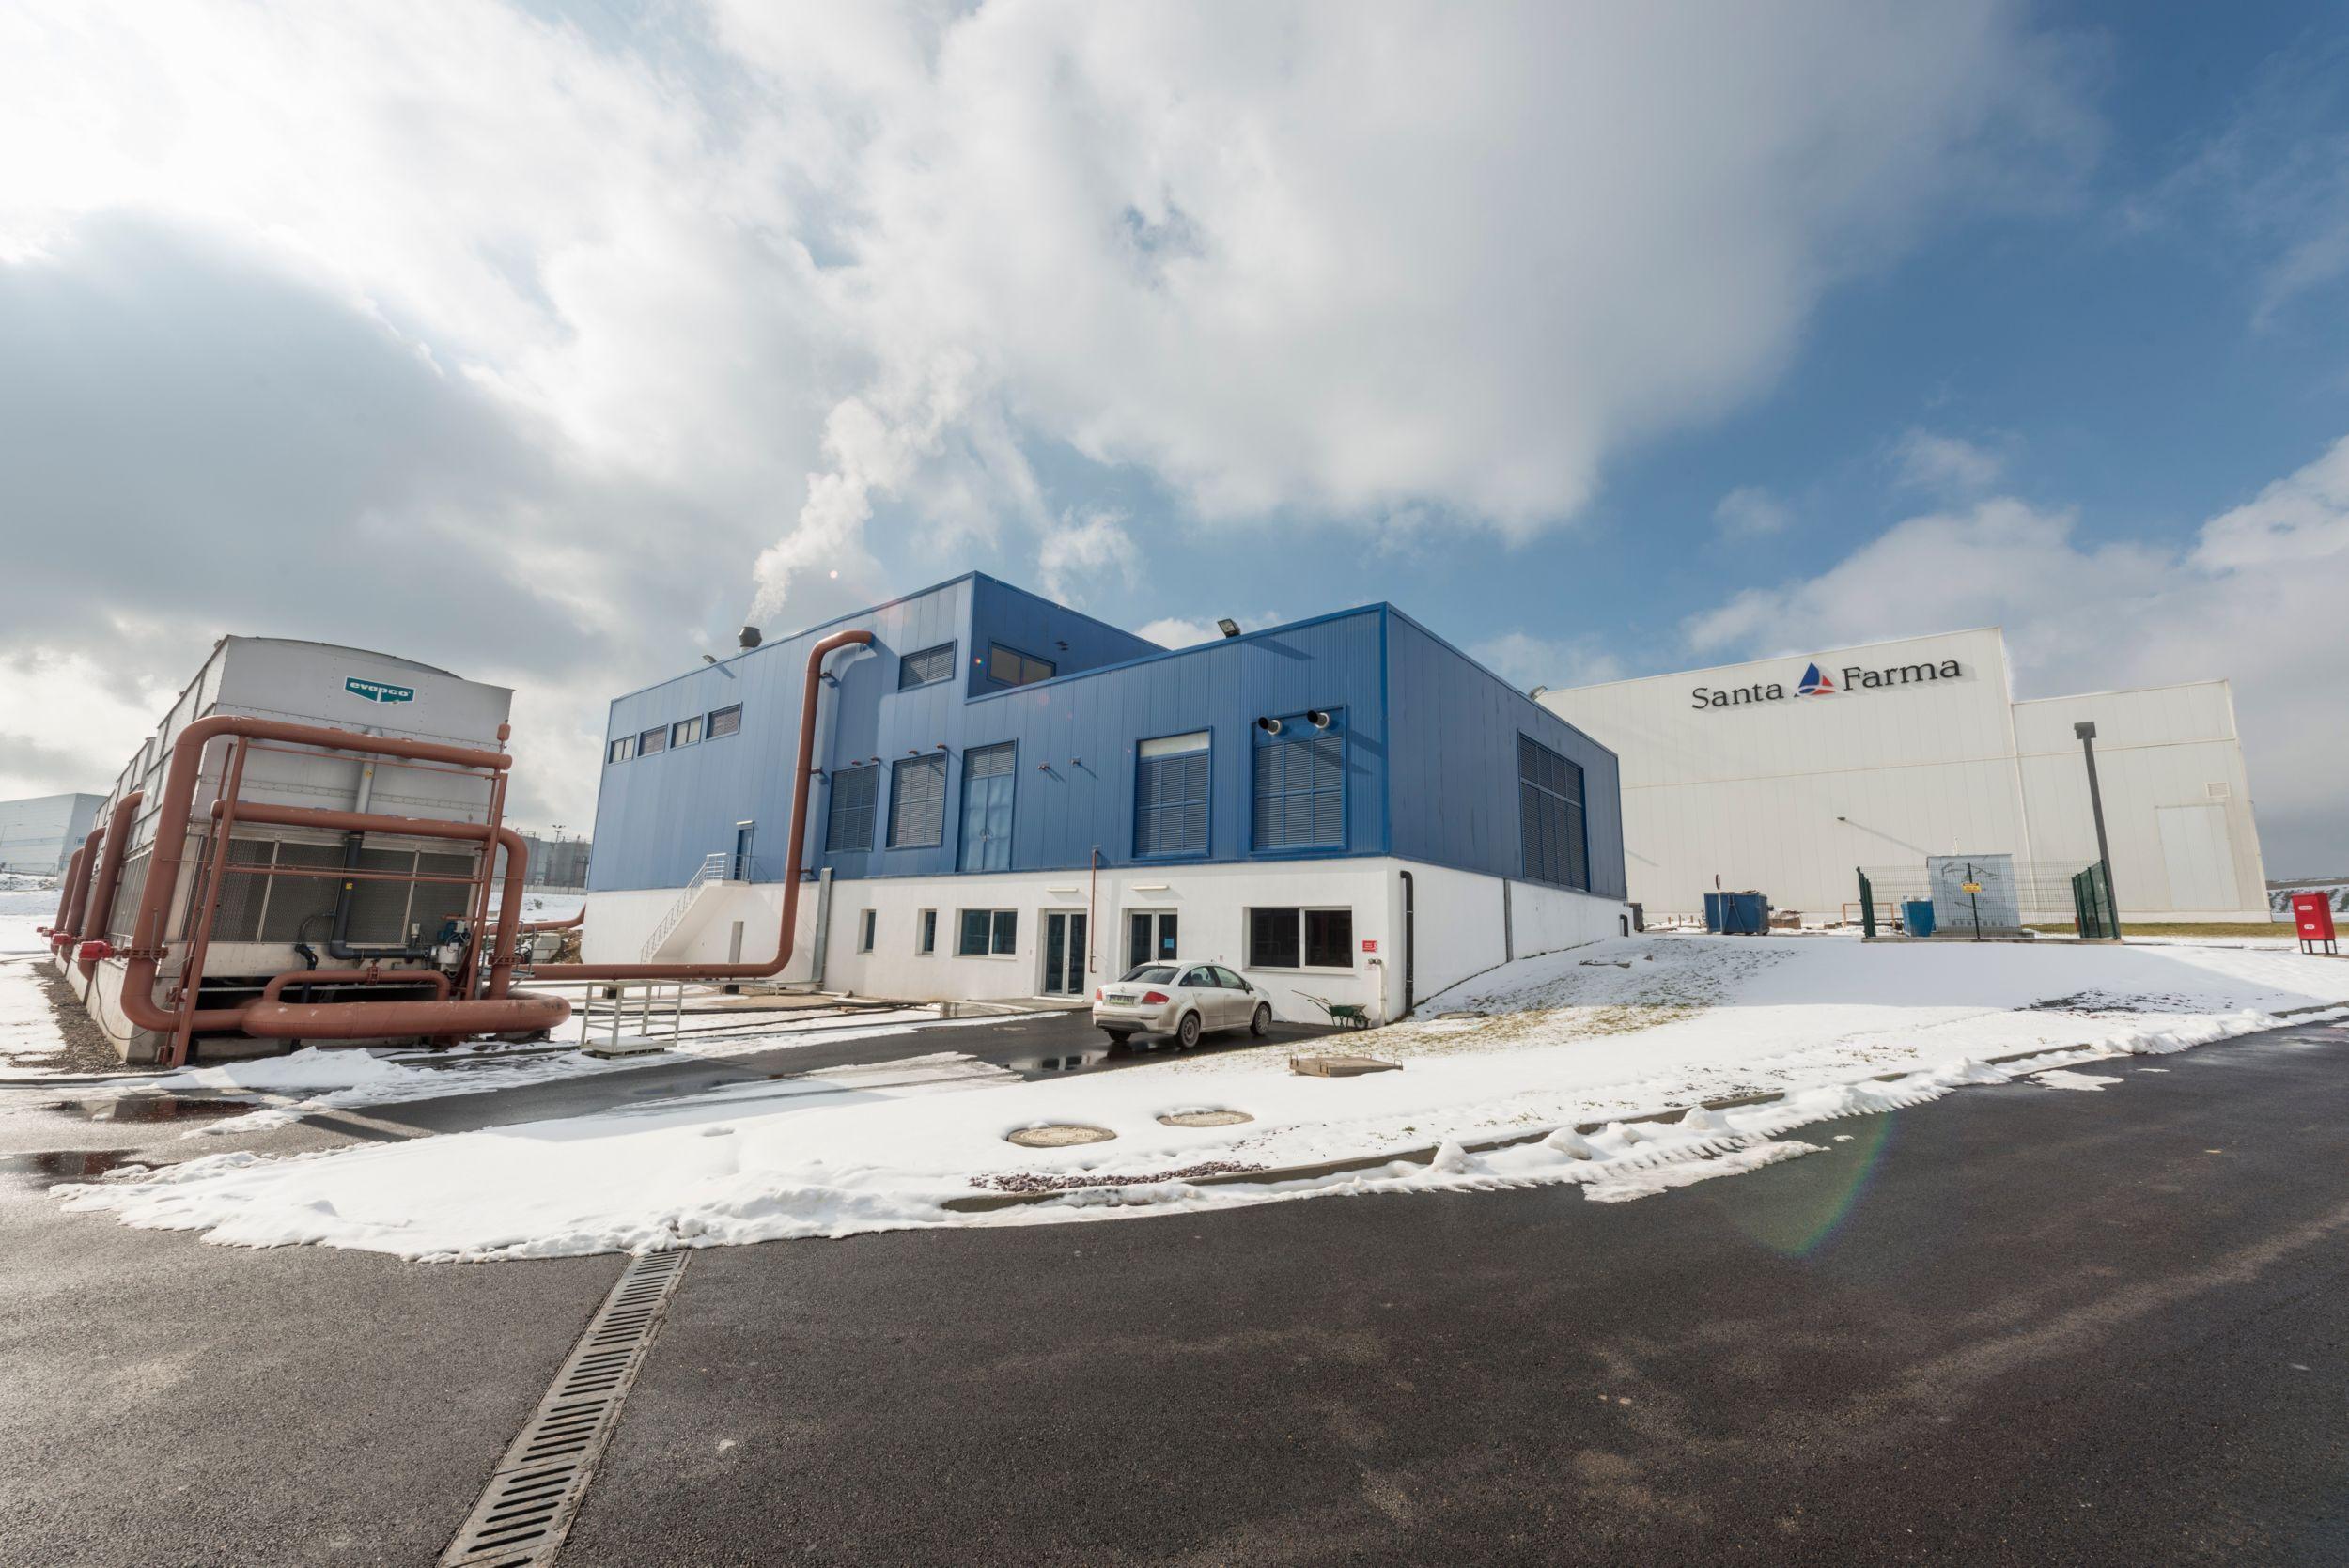 Santa Farma Medicine Production Facility